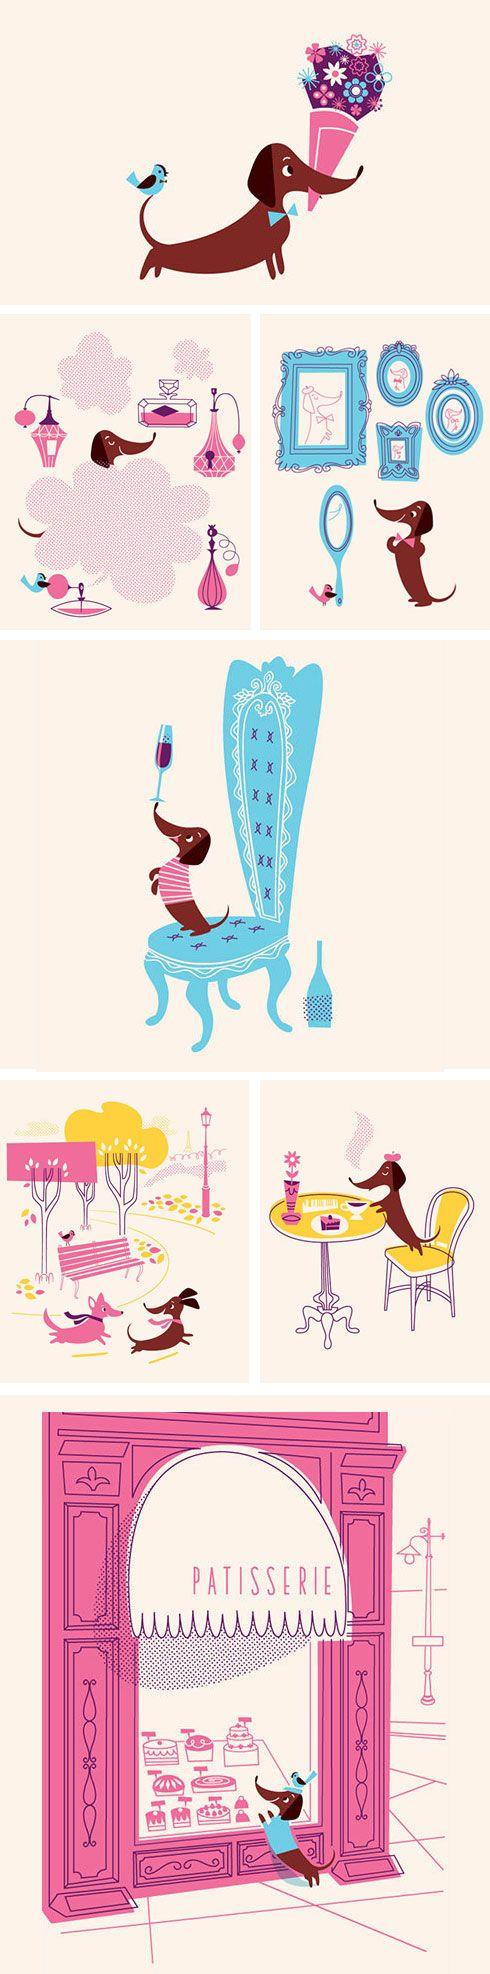 . ♥♥♥ dachshund dachshunds weenier weeniers weenie w eenies hot dog hotdogs doxie doxies ♥♥♥